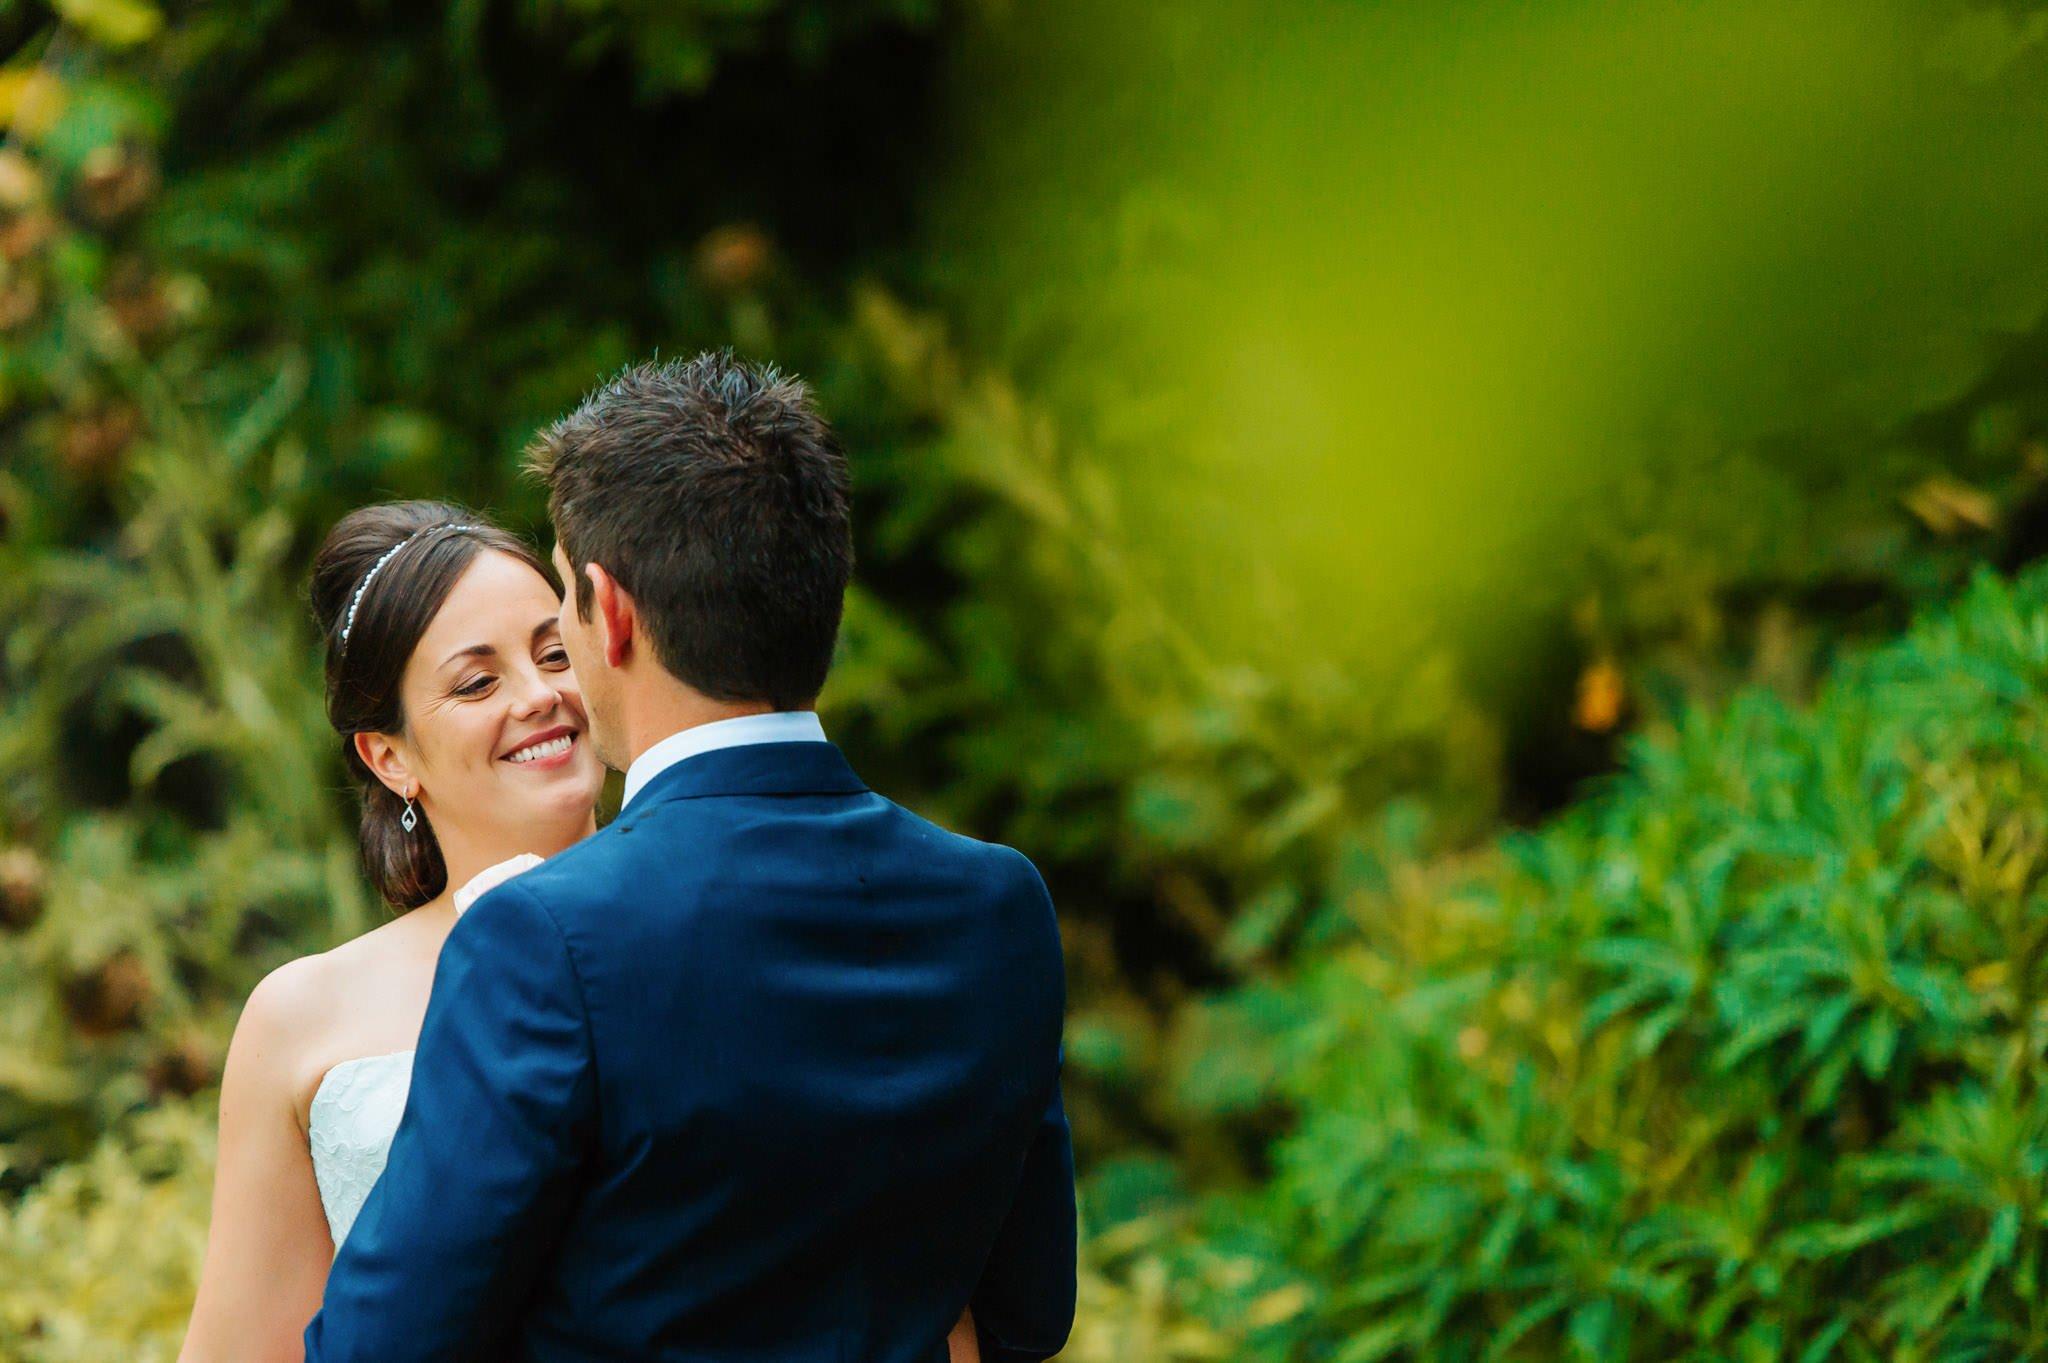 Eastnor Castle wedding photographer Herefordshire, West Midlands - Sarah + Dean 55